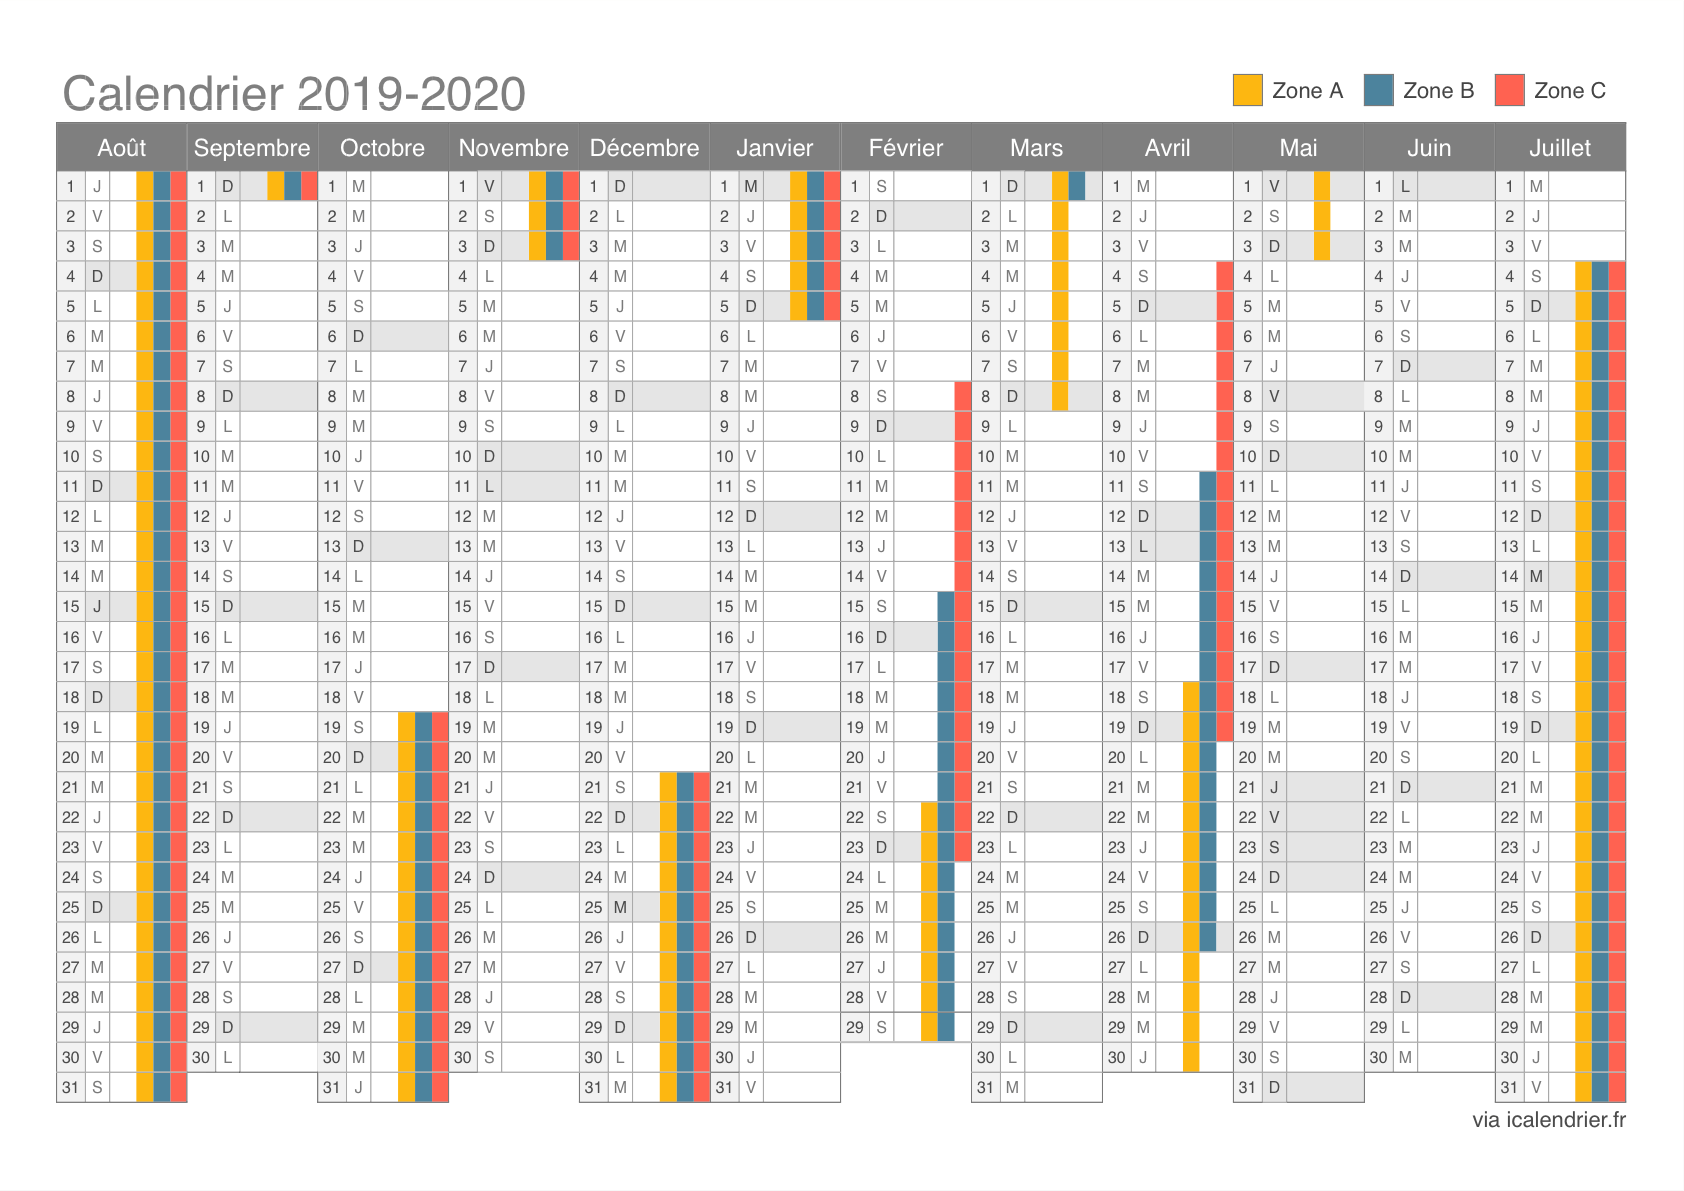 Calendrier Vacances 2020